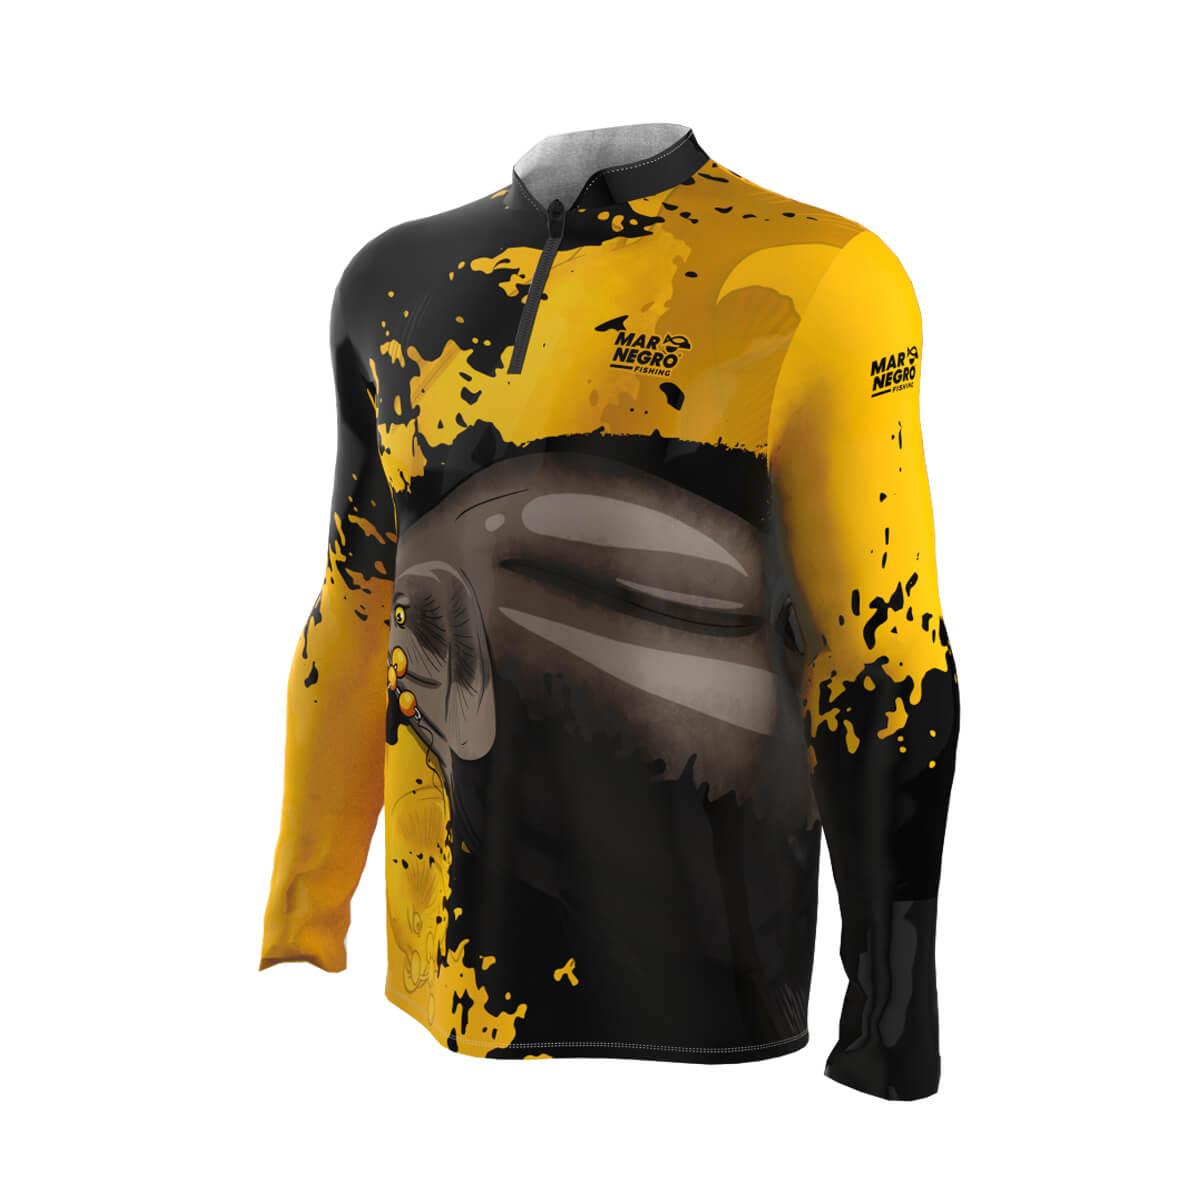 Camiseta Mar Negro 2021 Tamba  - Pró Pesca Shop